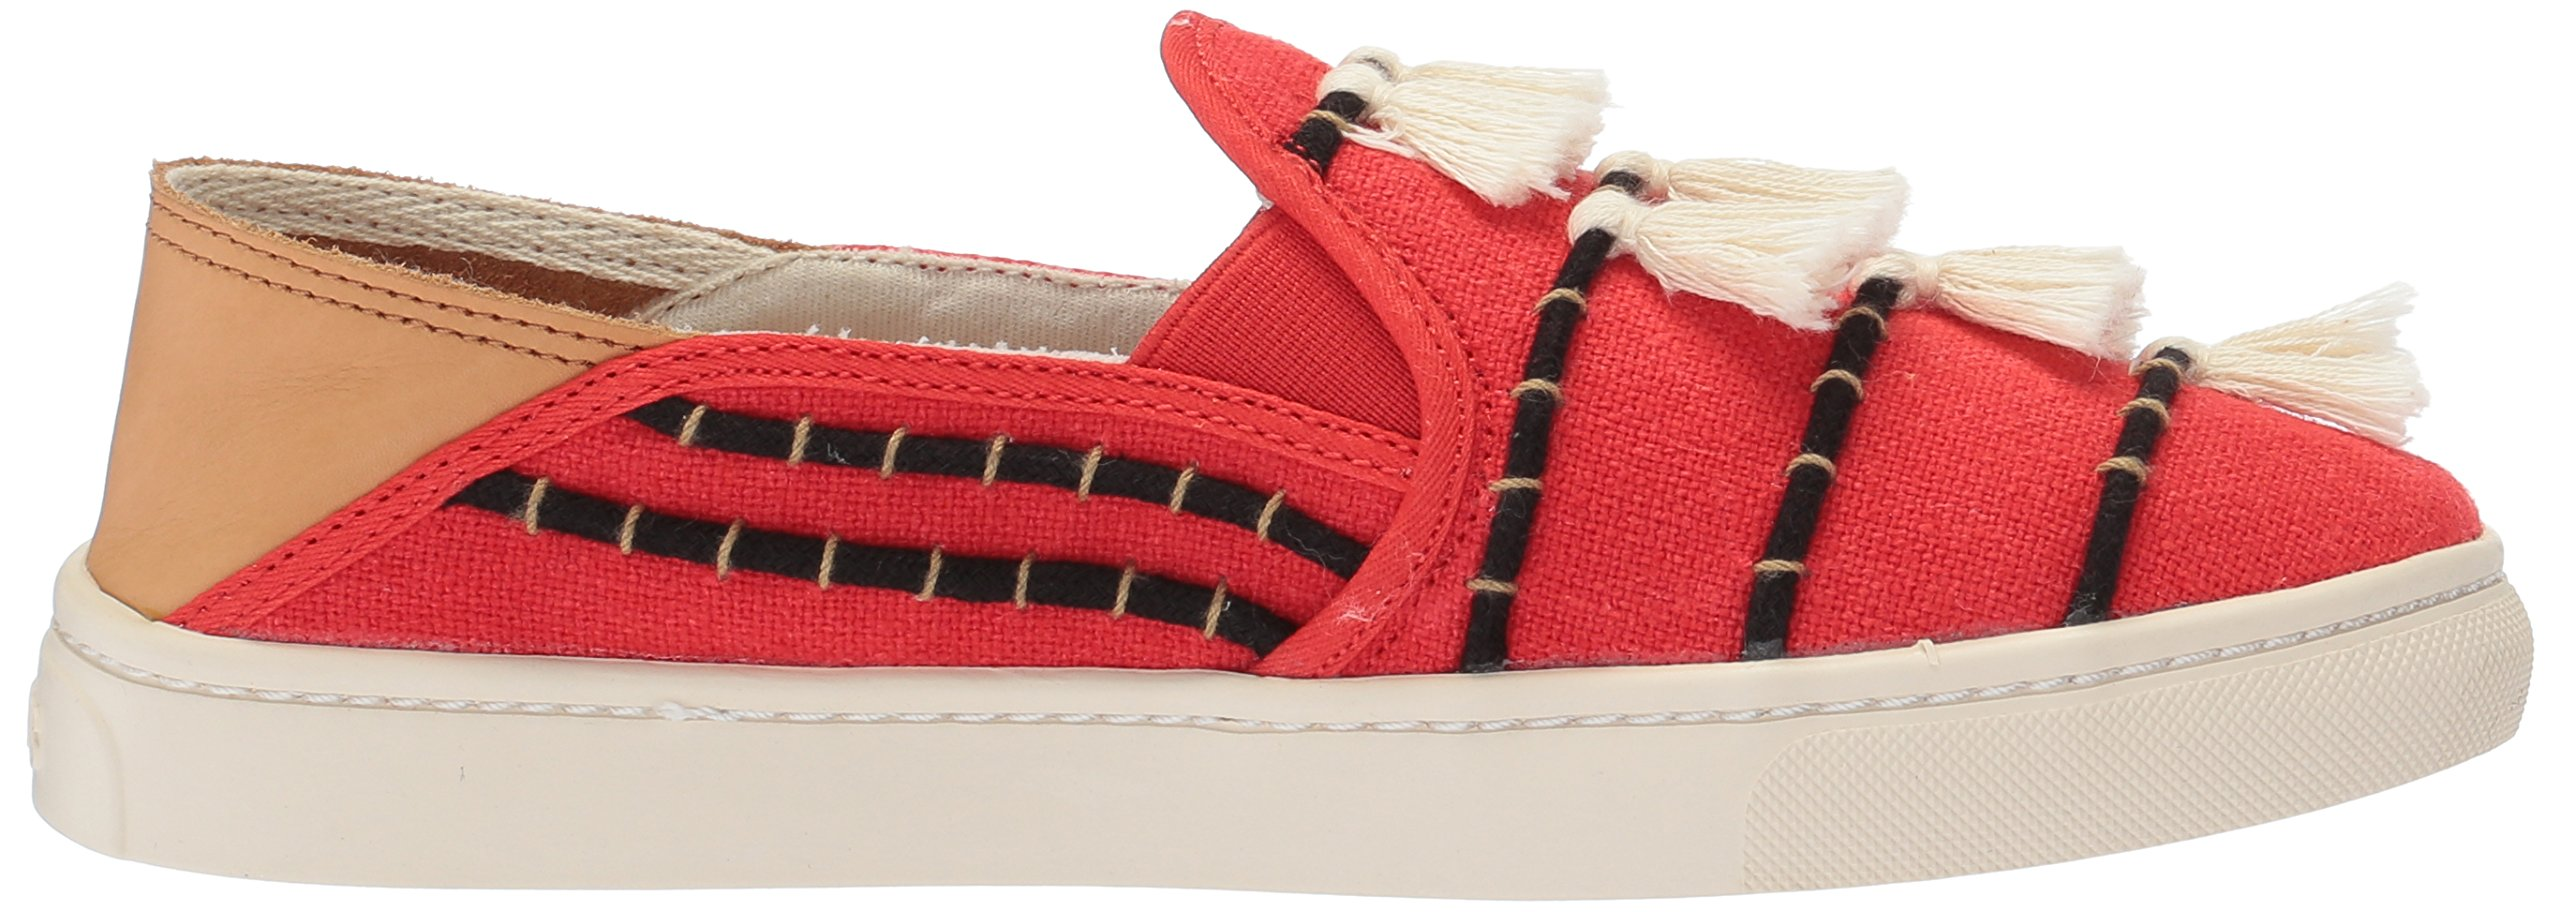 Soludos Women's Tassel Slip Sneaker, Red/Beige, 8 B US by Soludos (Image #7)